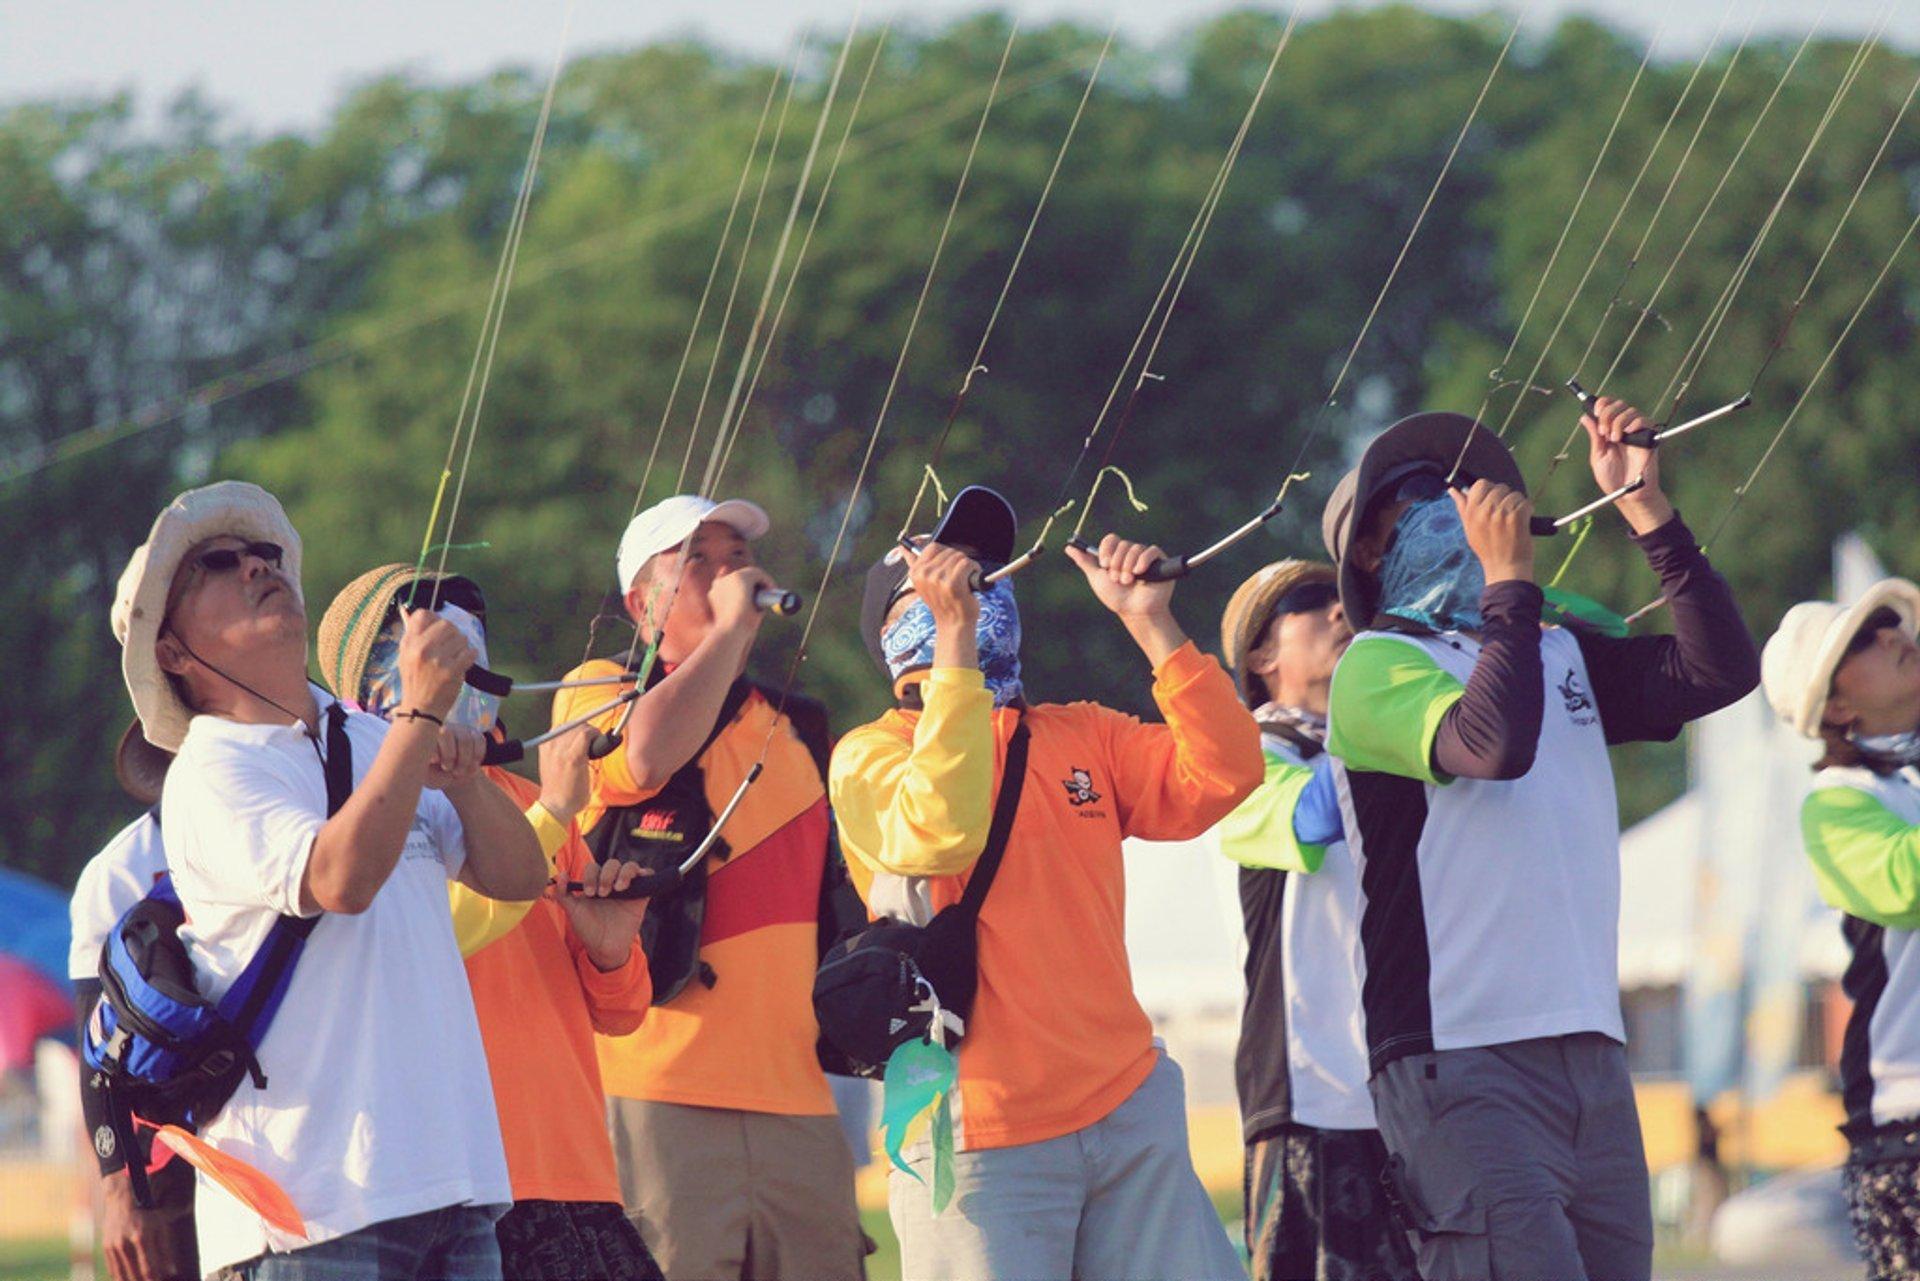 Borneo International Kite Festival in Borneo - Best Season